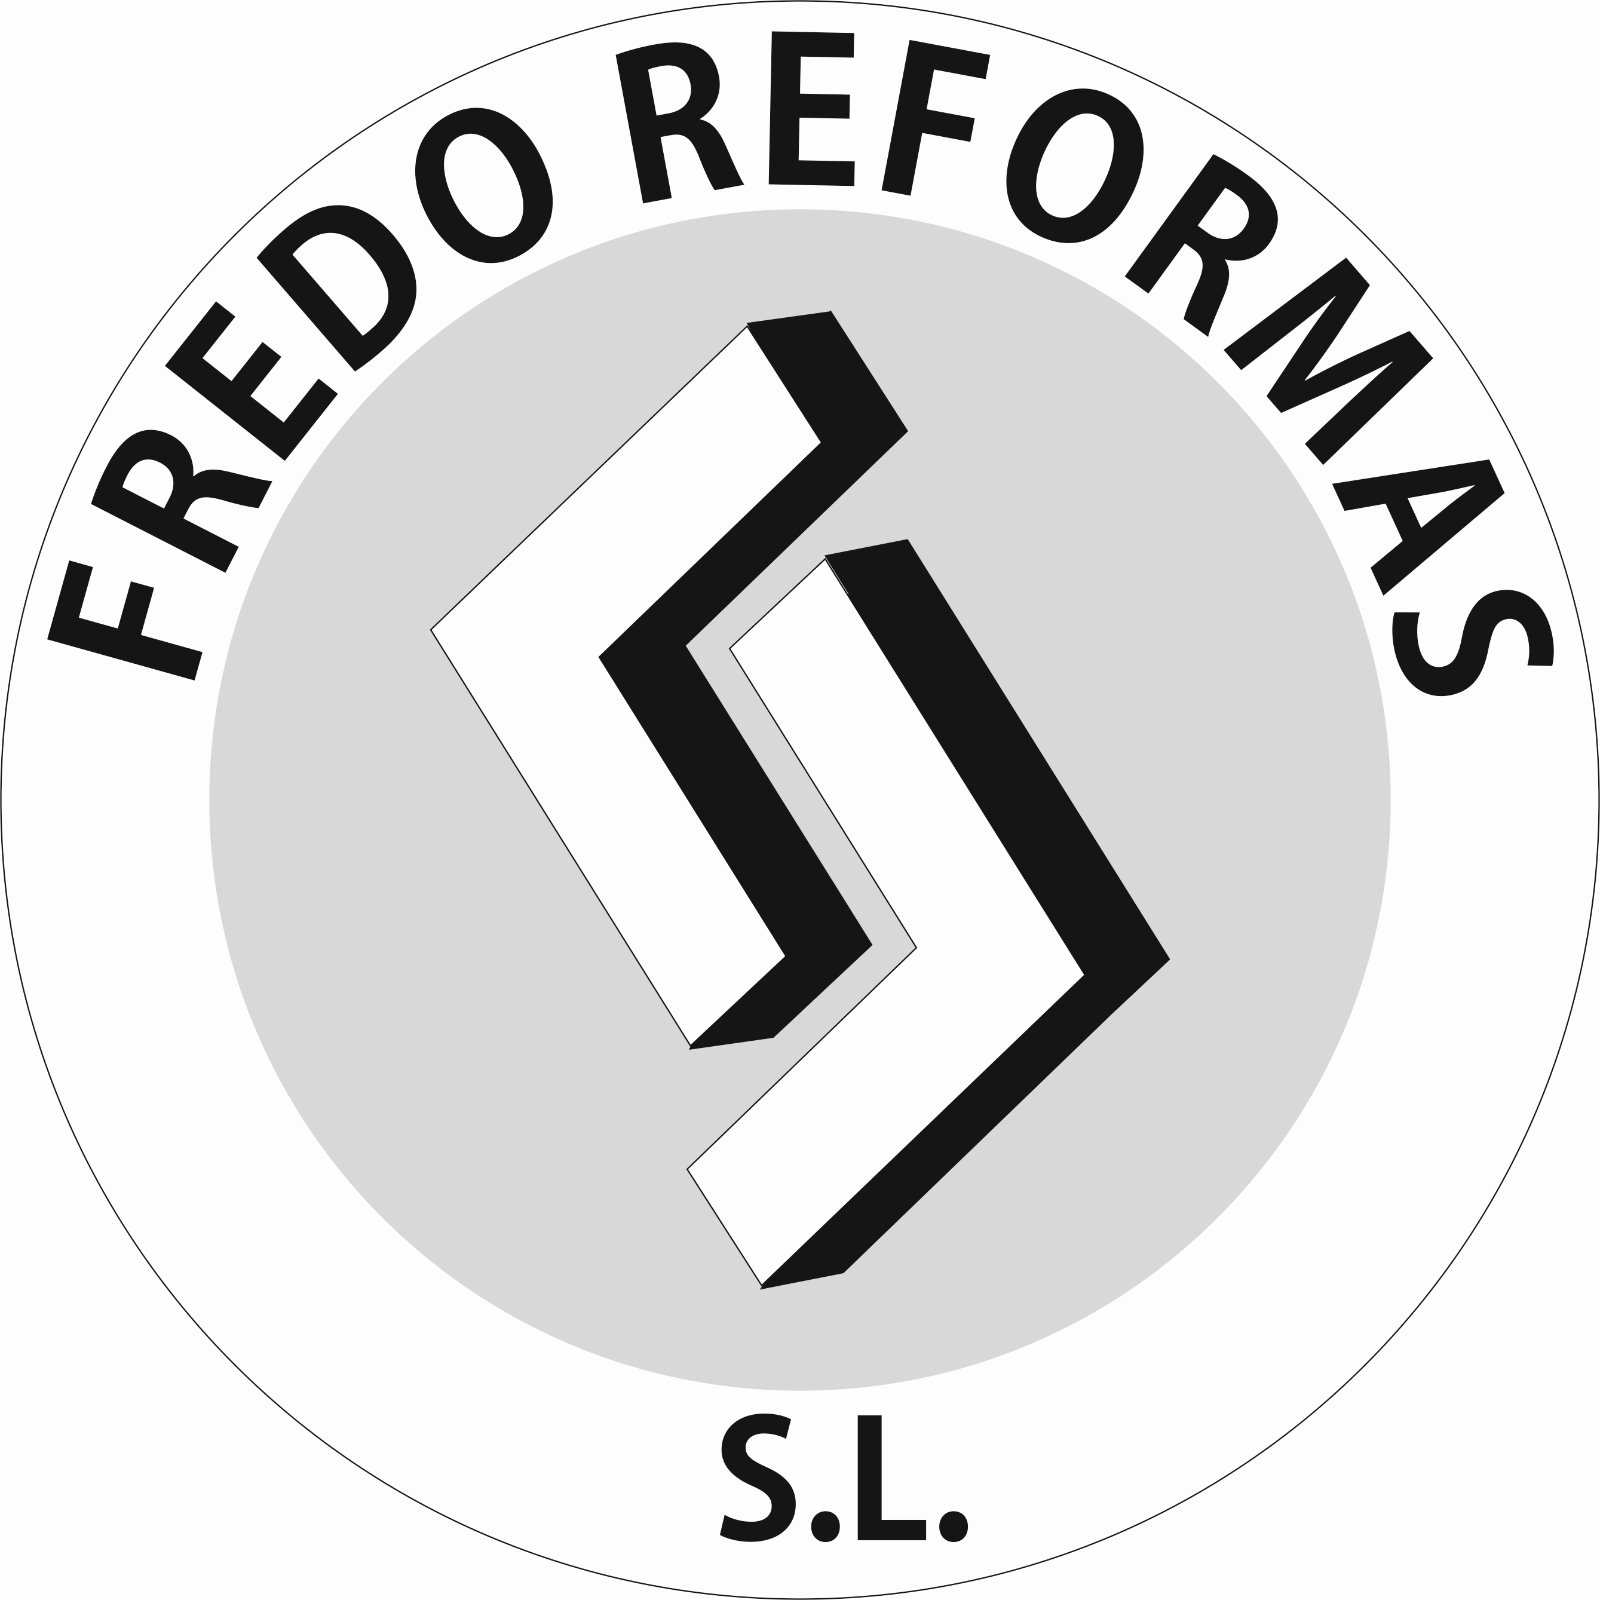 FREDO REFORMAS SL